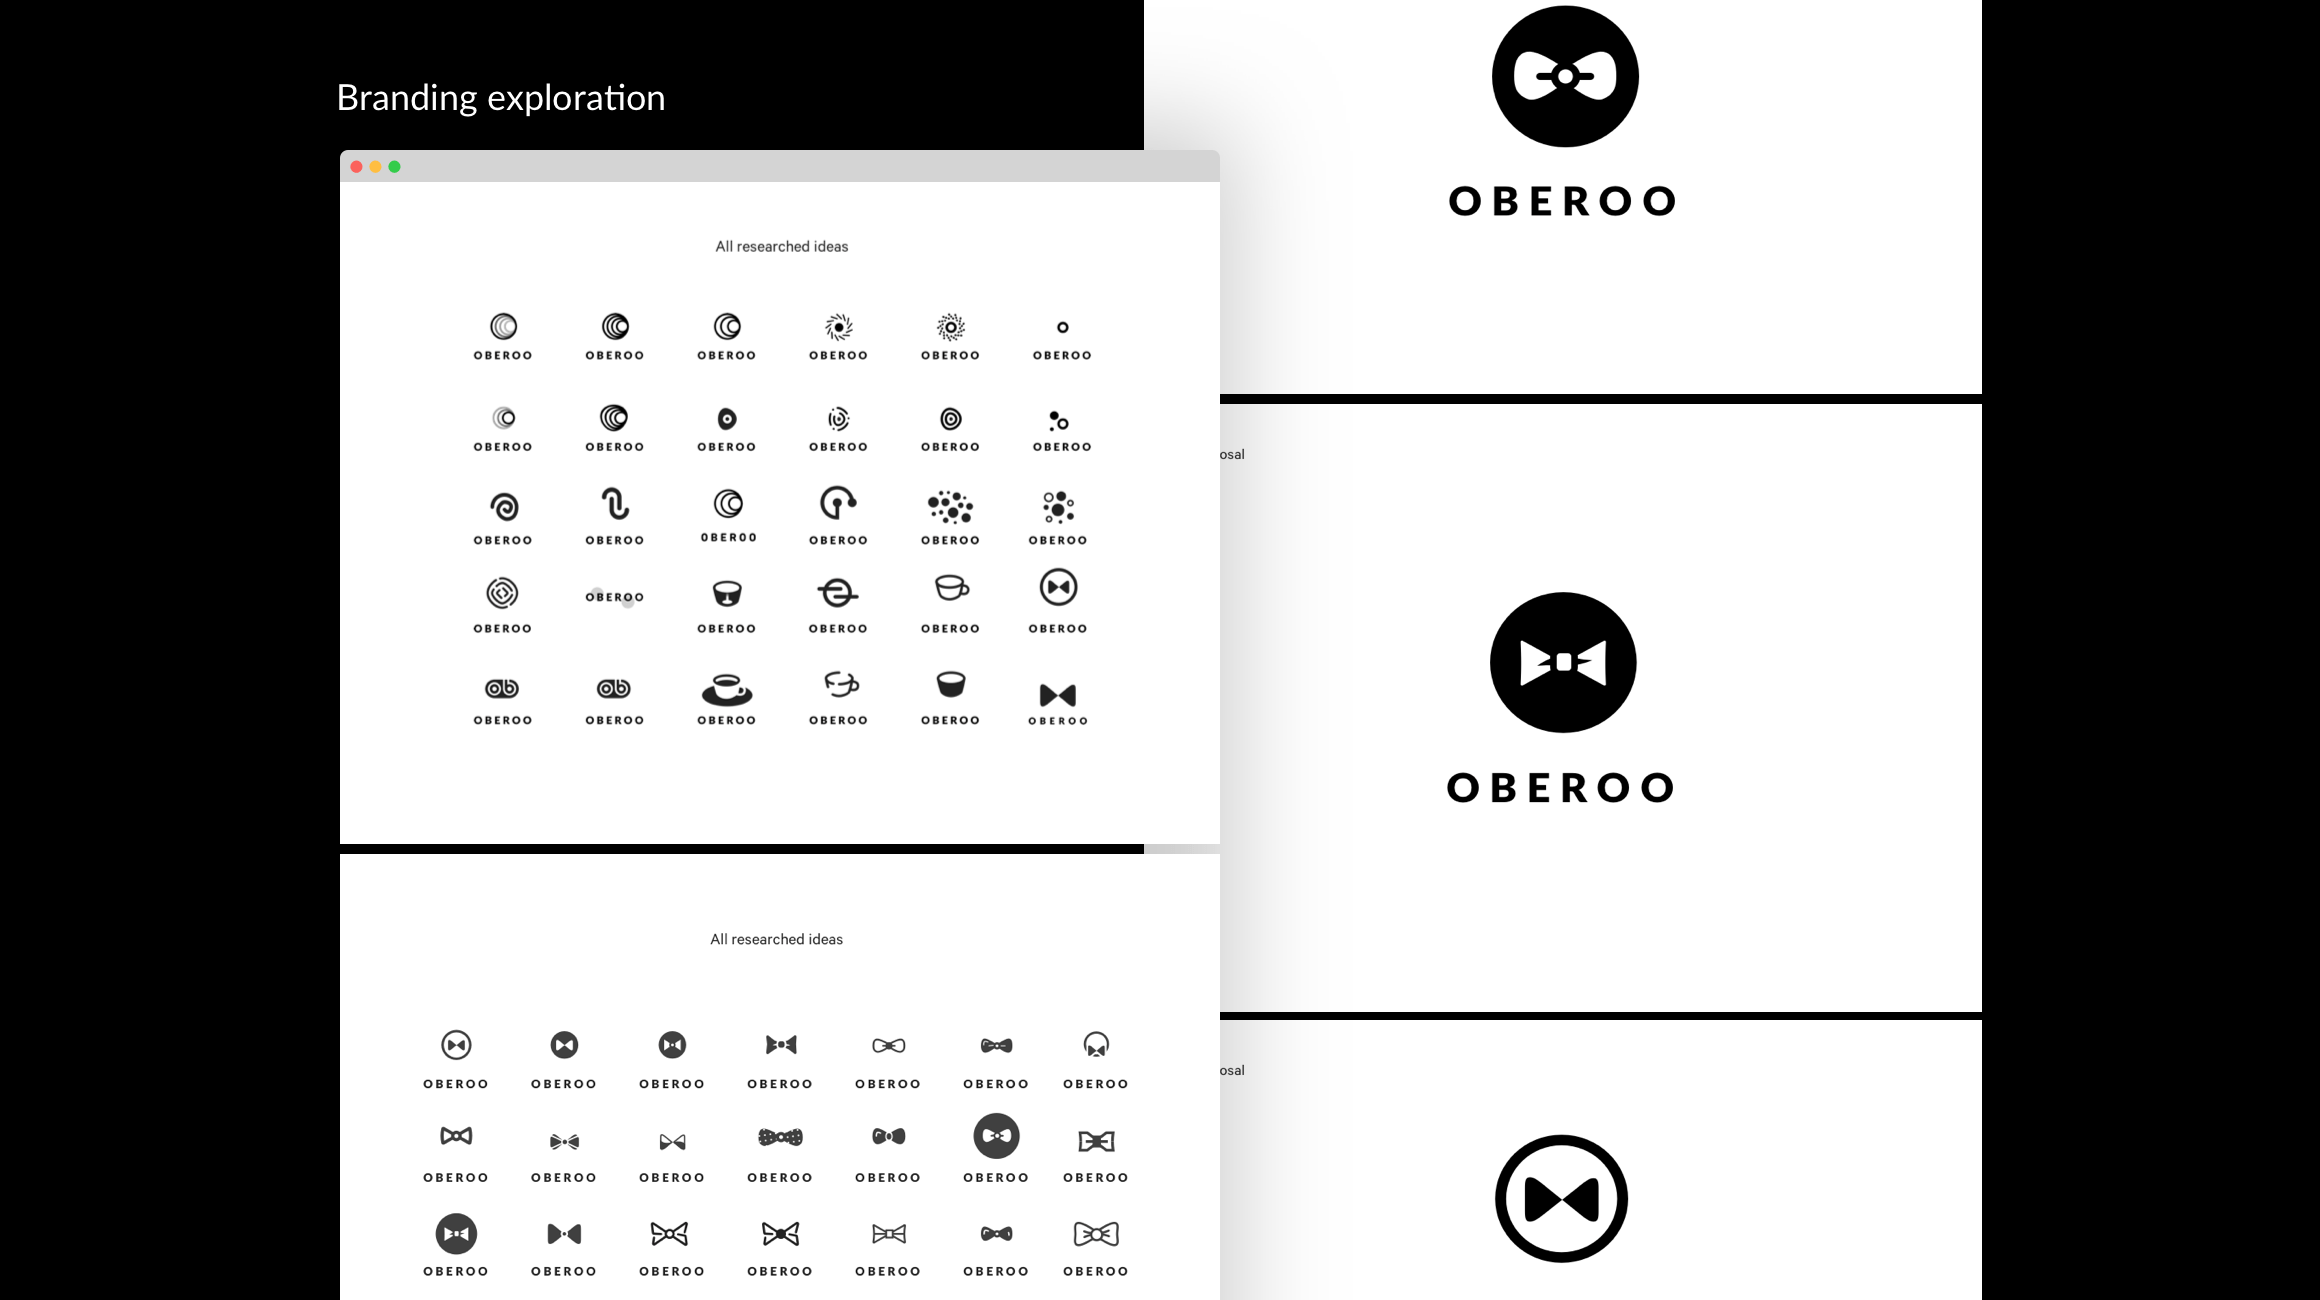 3_Oberoo_fullsize_2x